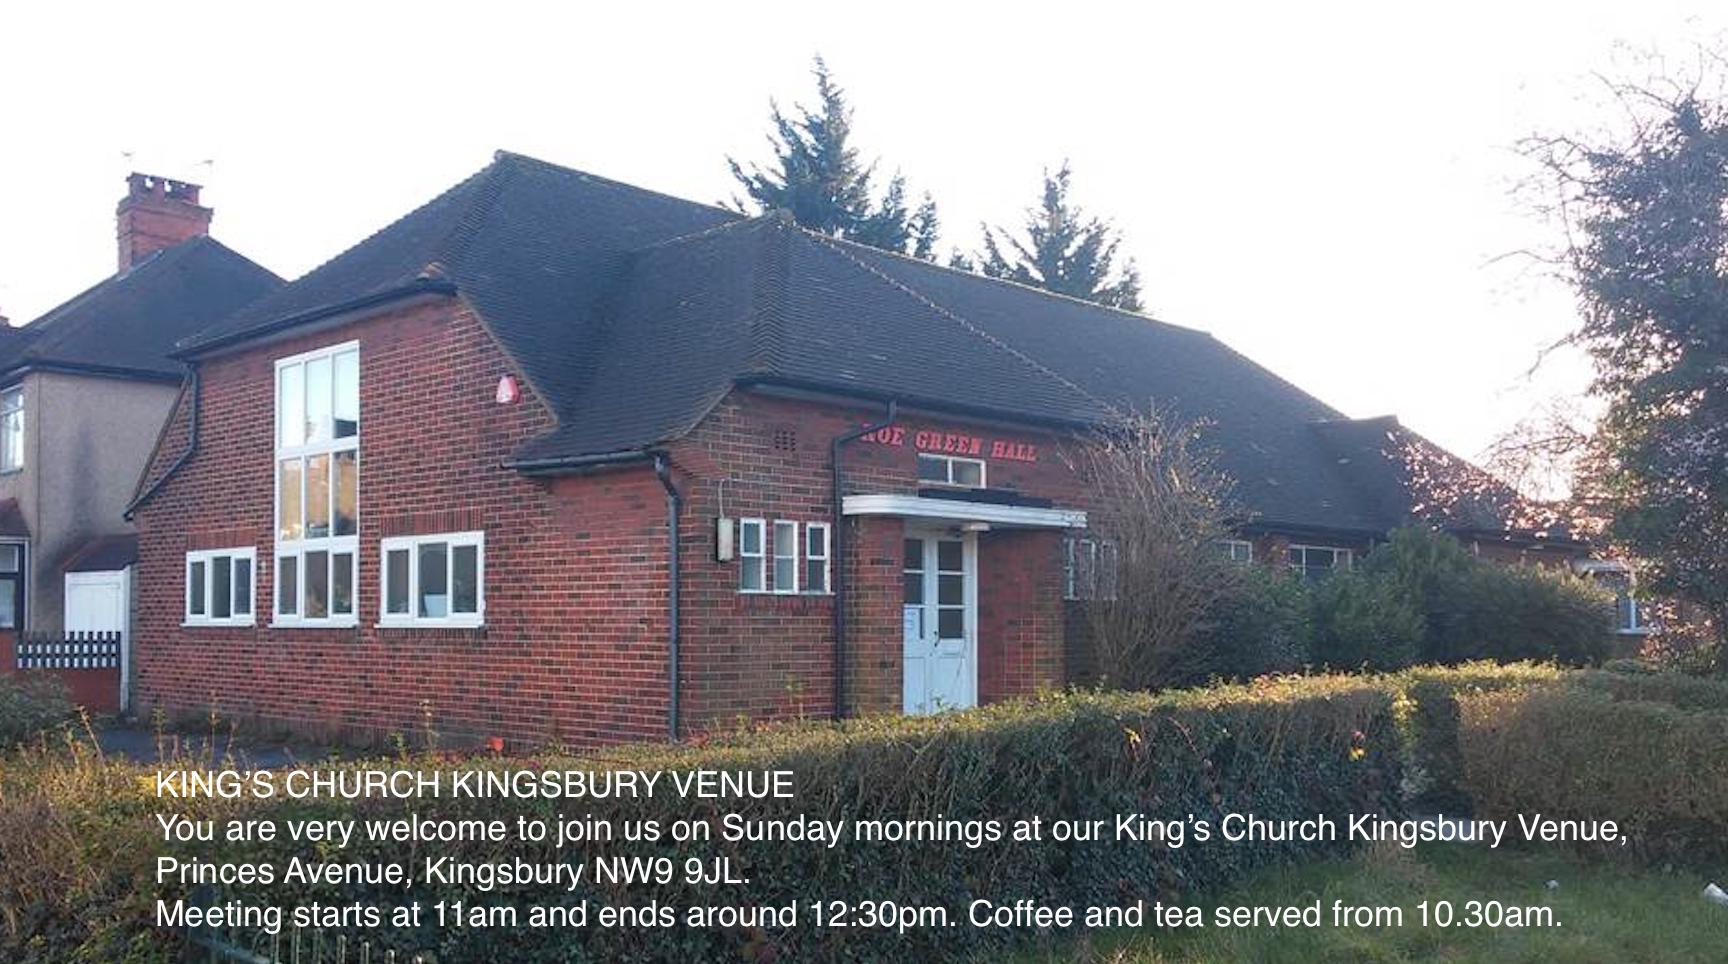 King's Church Kingsbury Venue